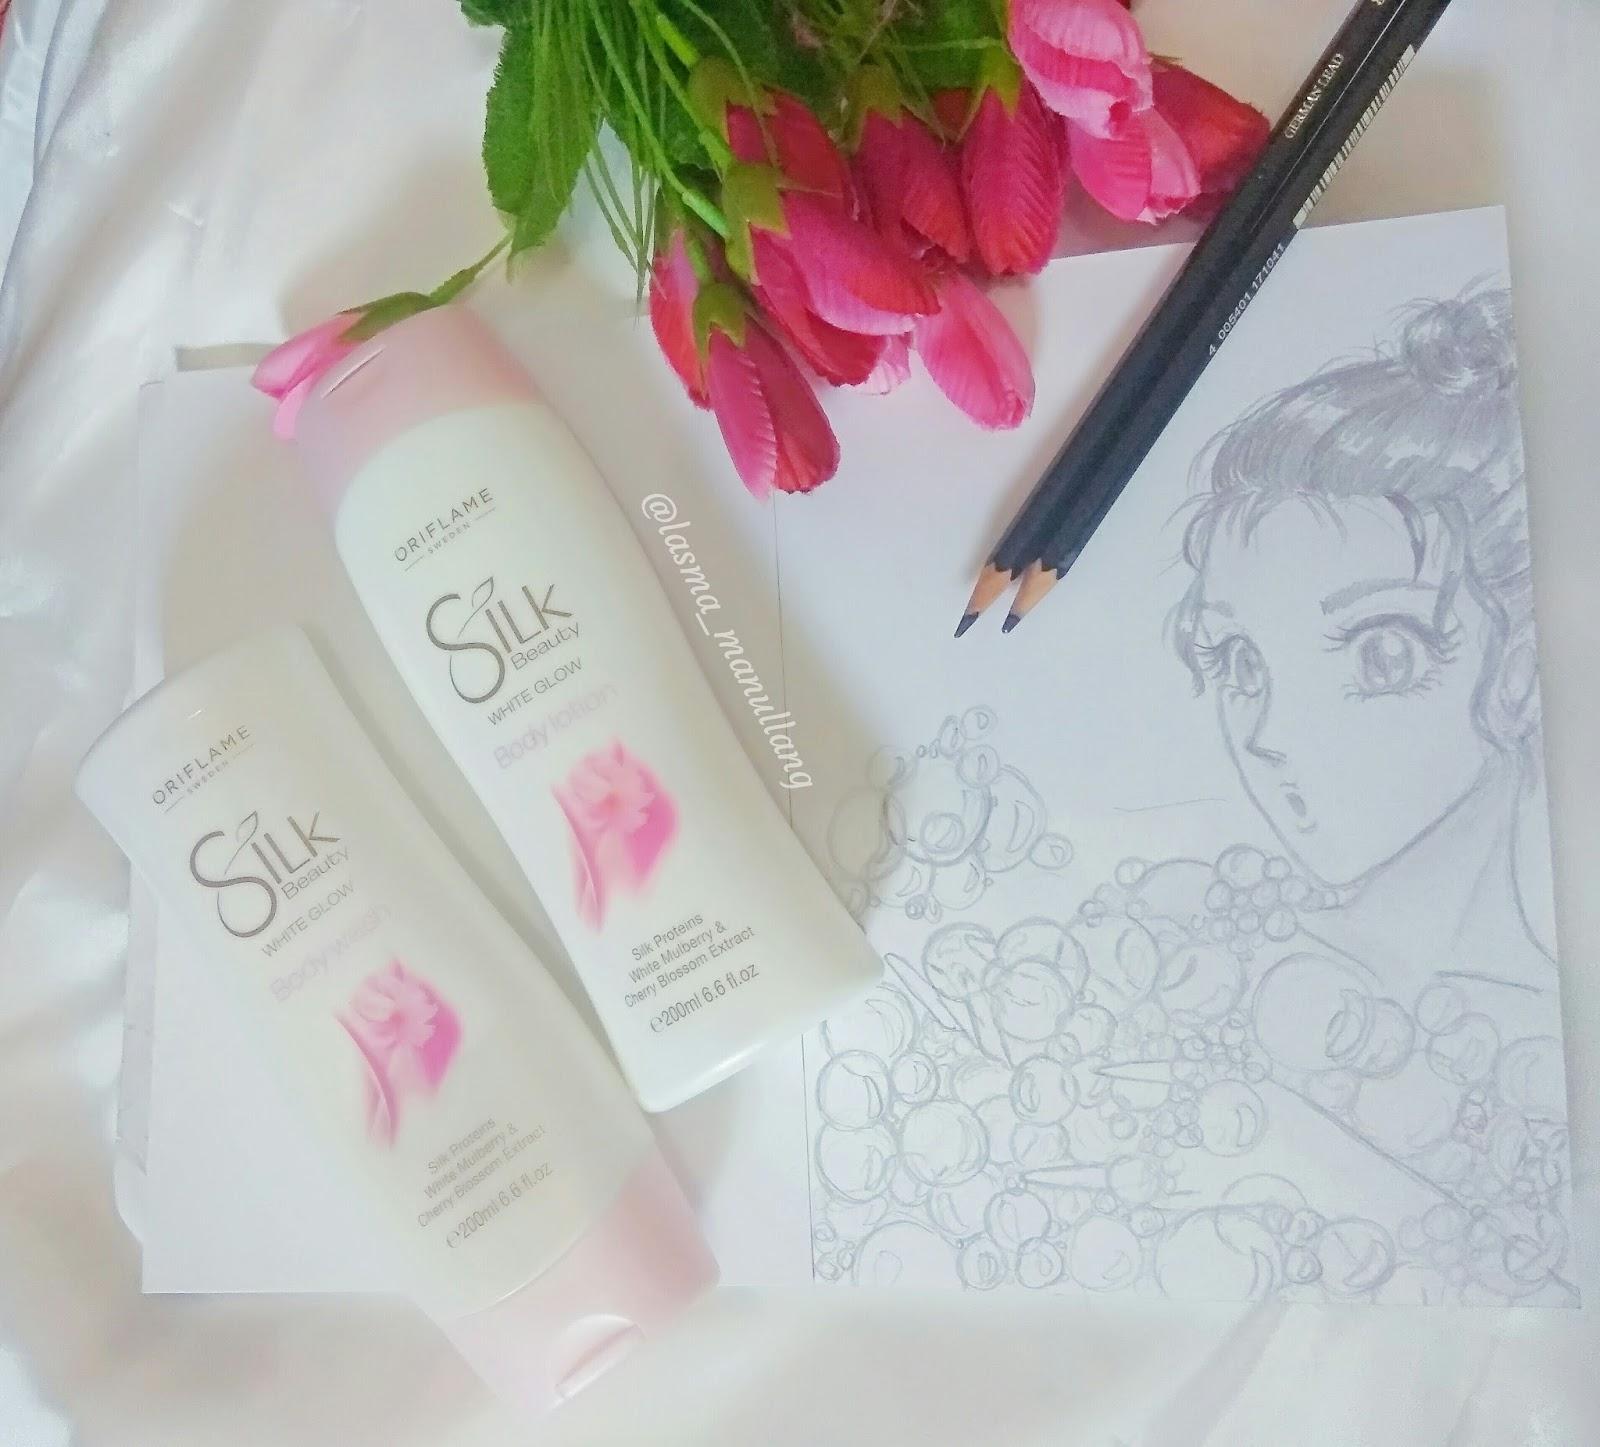 Senka White Beauty Lotion Ii Review: [REVIEW] Silk Beauty White Glow Body Shower & Body Lotion